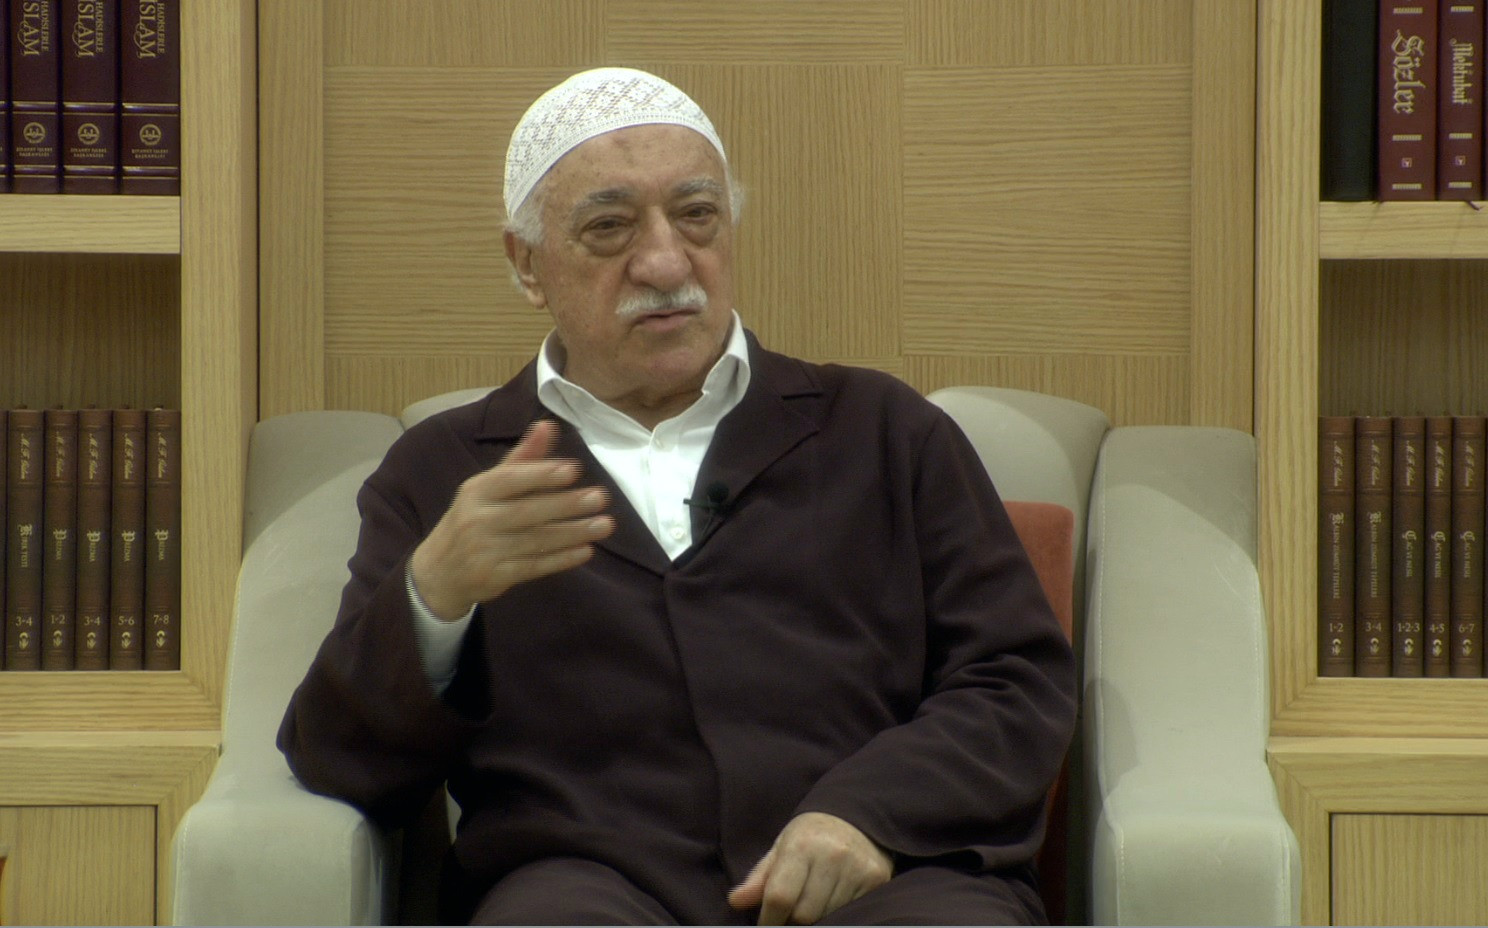 FETÖ elebaşına ''Mehdi'' demişti... İşte istenen ceza